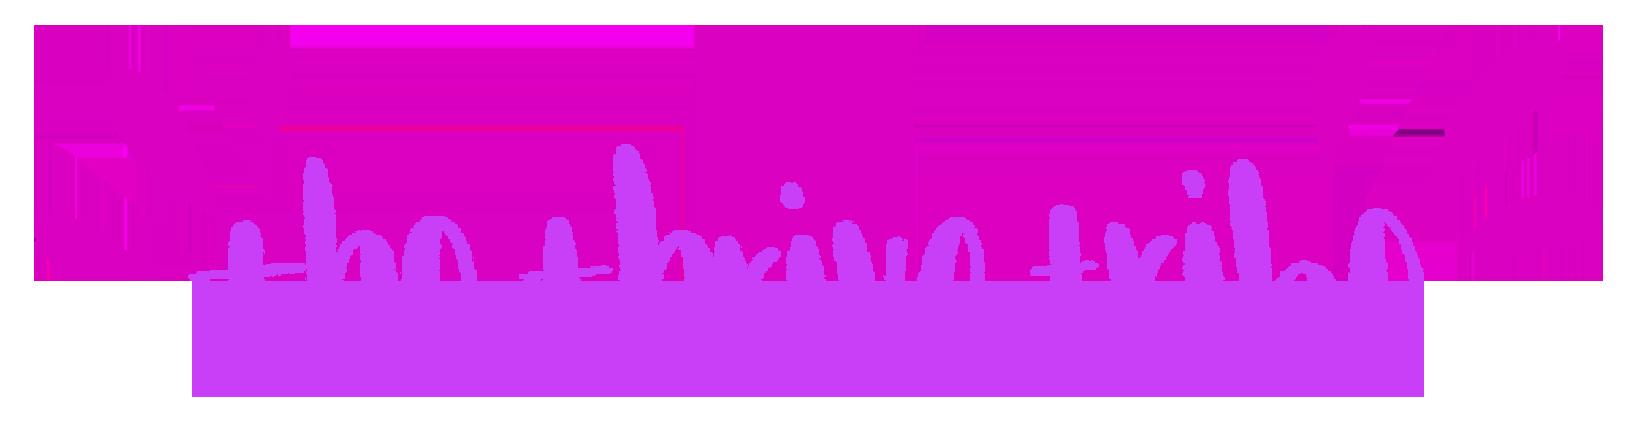 logo-purple-pink